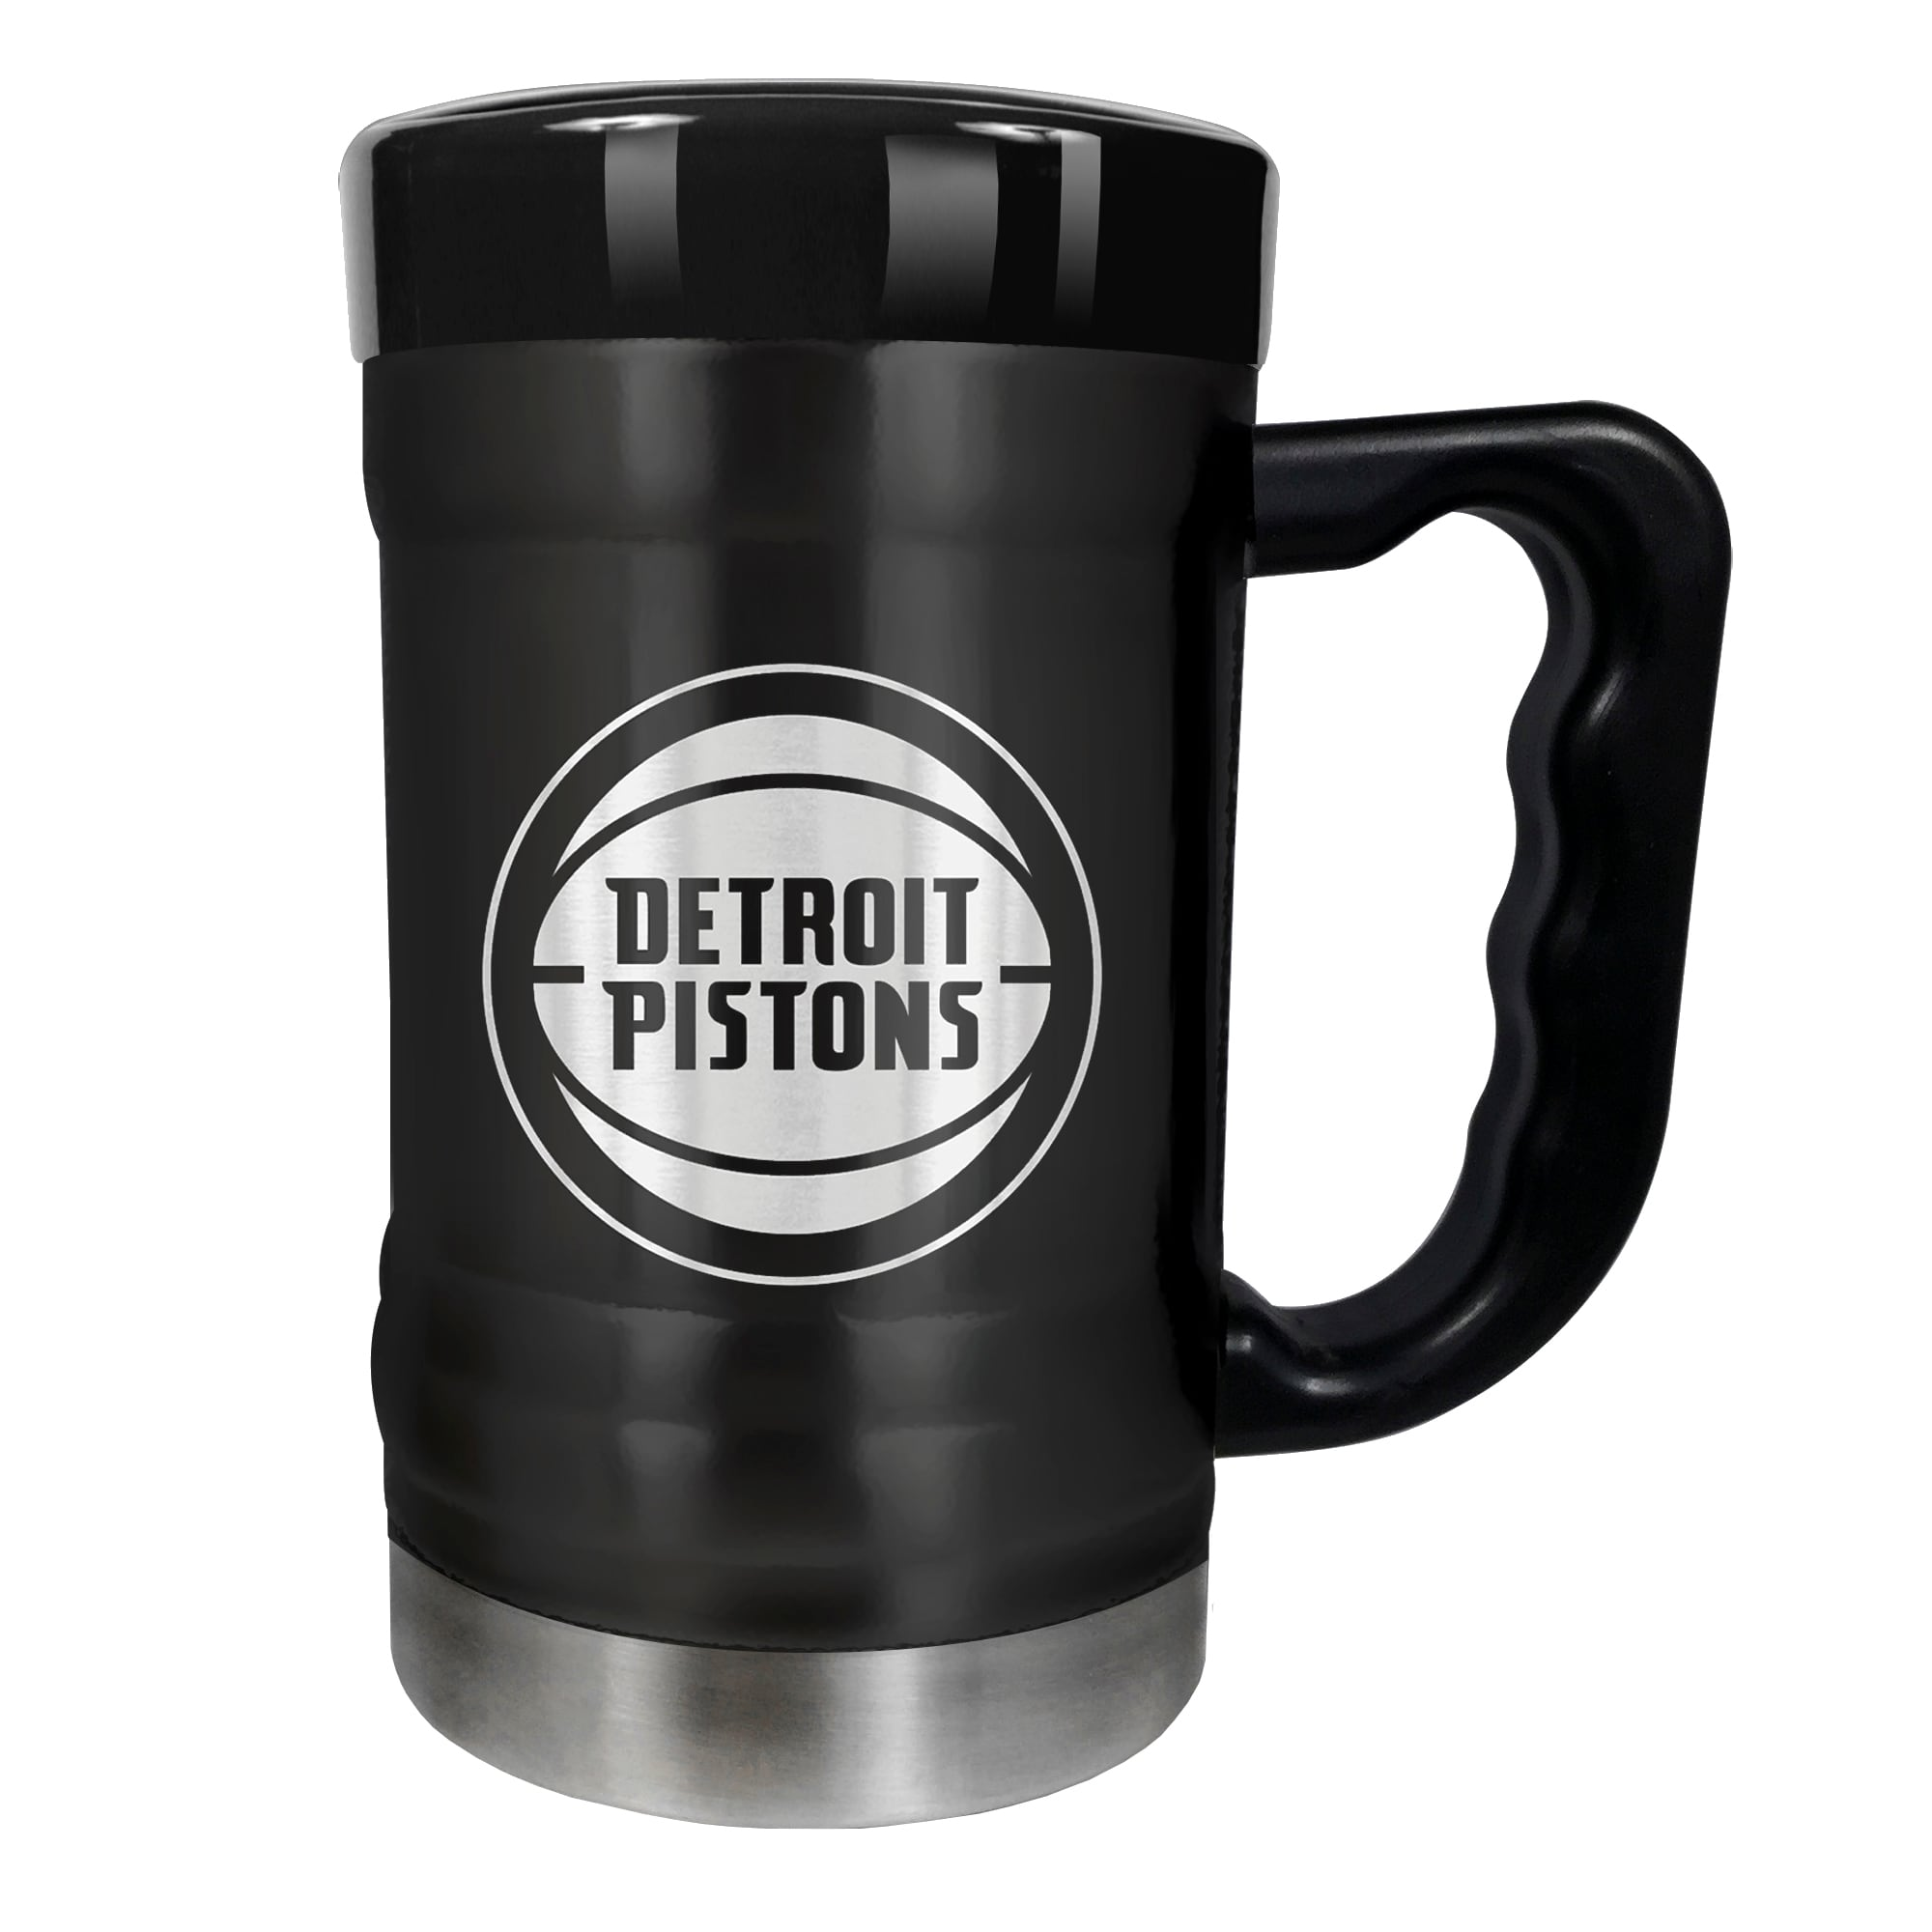 Detroit Pistons 15oz. Stealth Coach Coffee Mug - Black